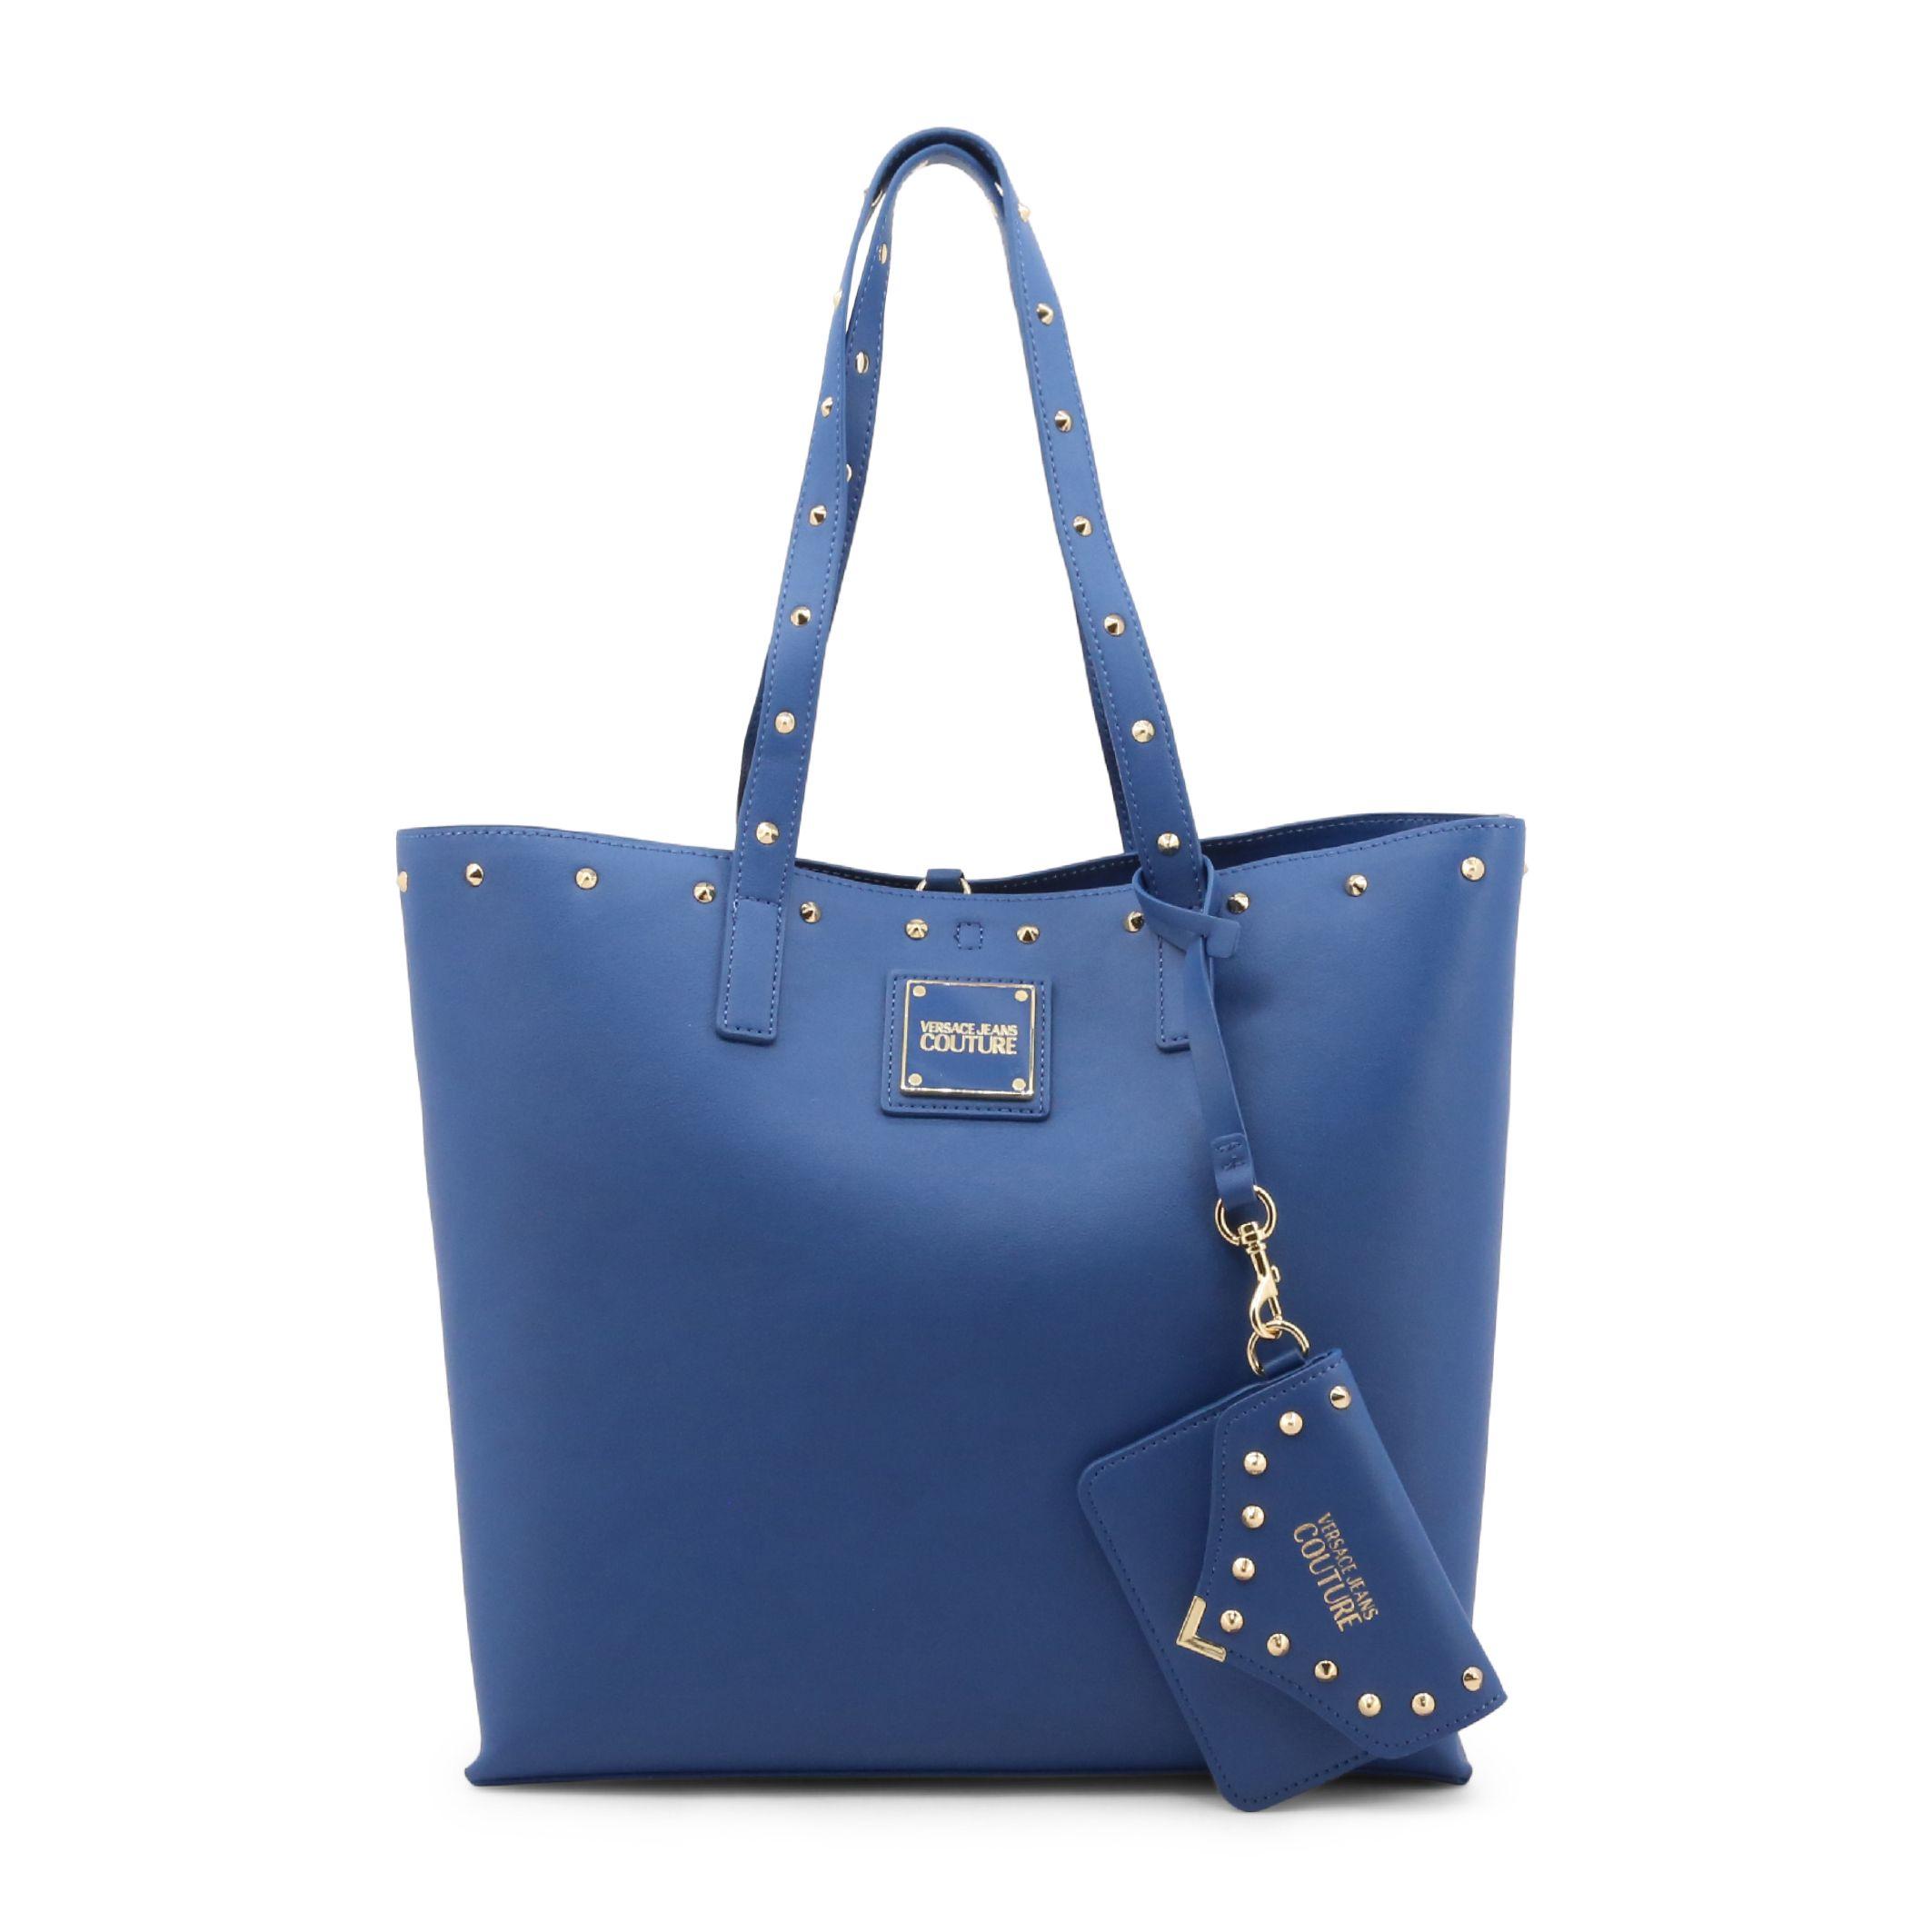 Versace Jeans – 71VA4BE9_71407 – Blauw Designeritems.nl